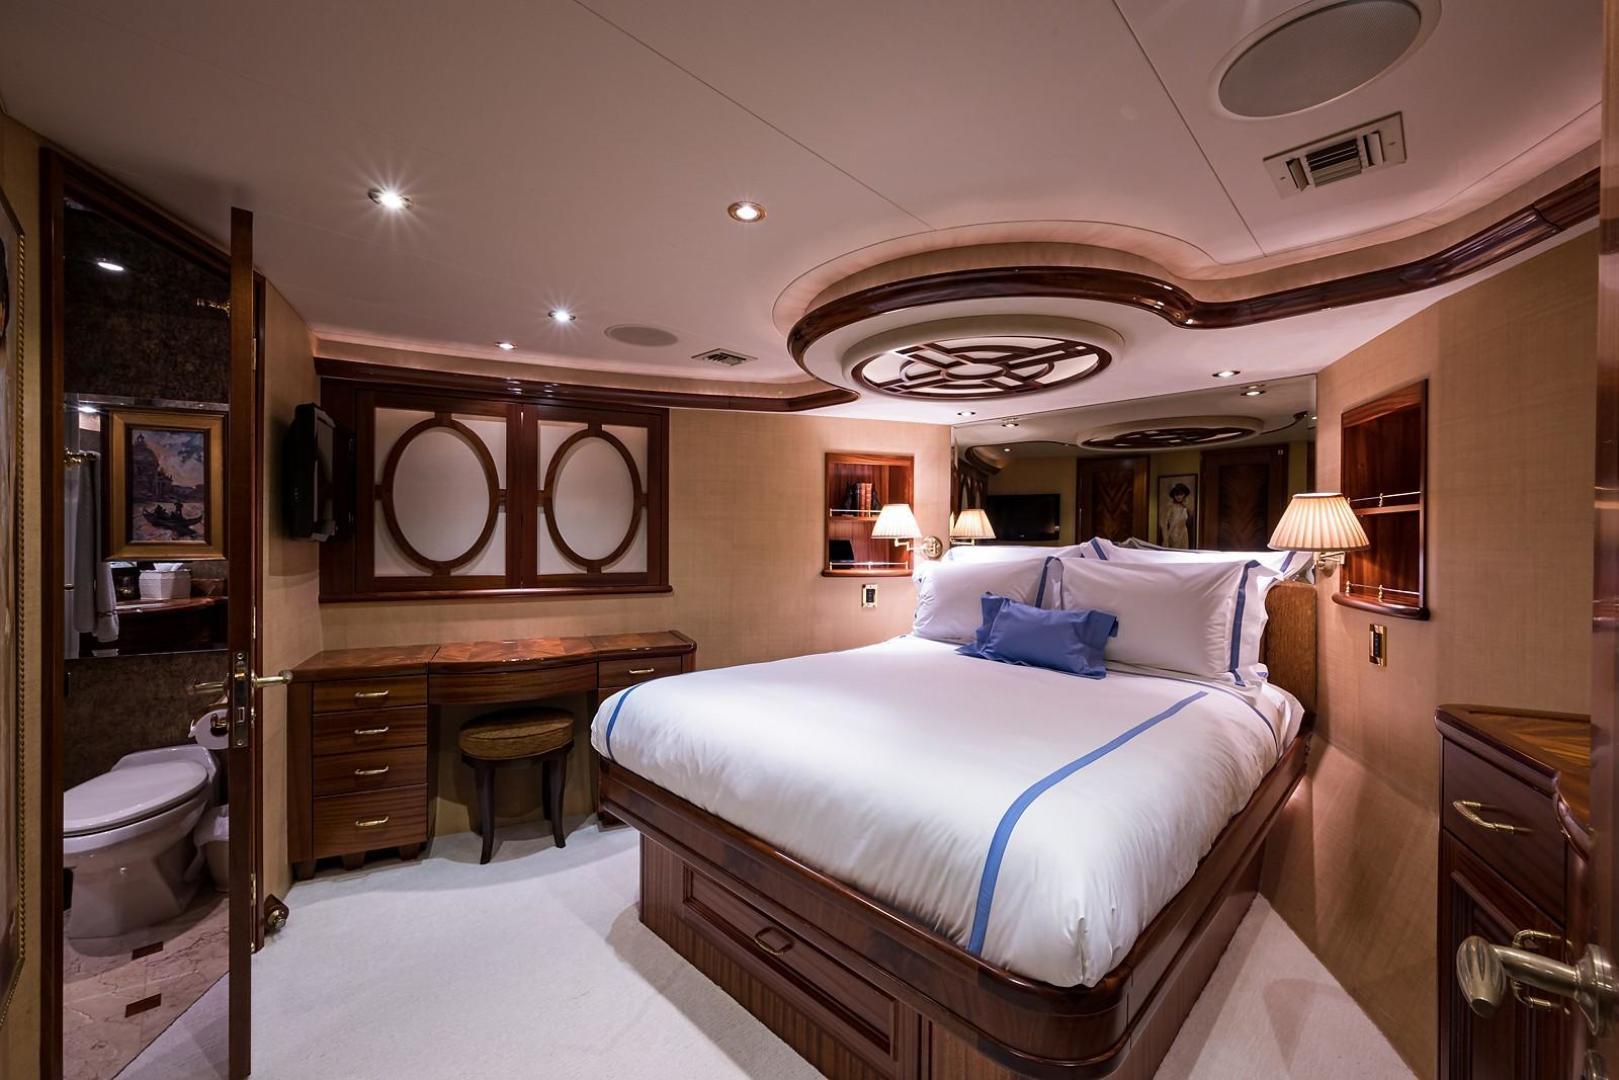 Westport-Motoryacht 2010-Cavallino Fort Lauderdale-Florida-United States-VIP Stateroom-1270097 | Thumbnail